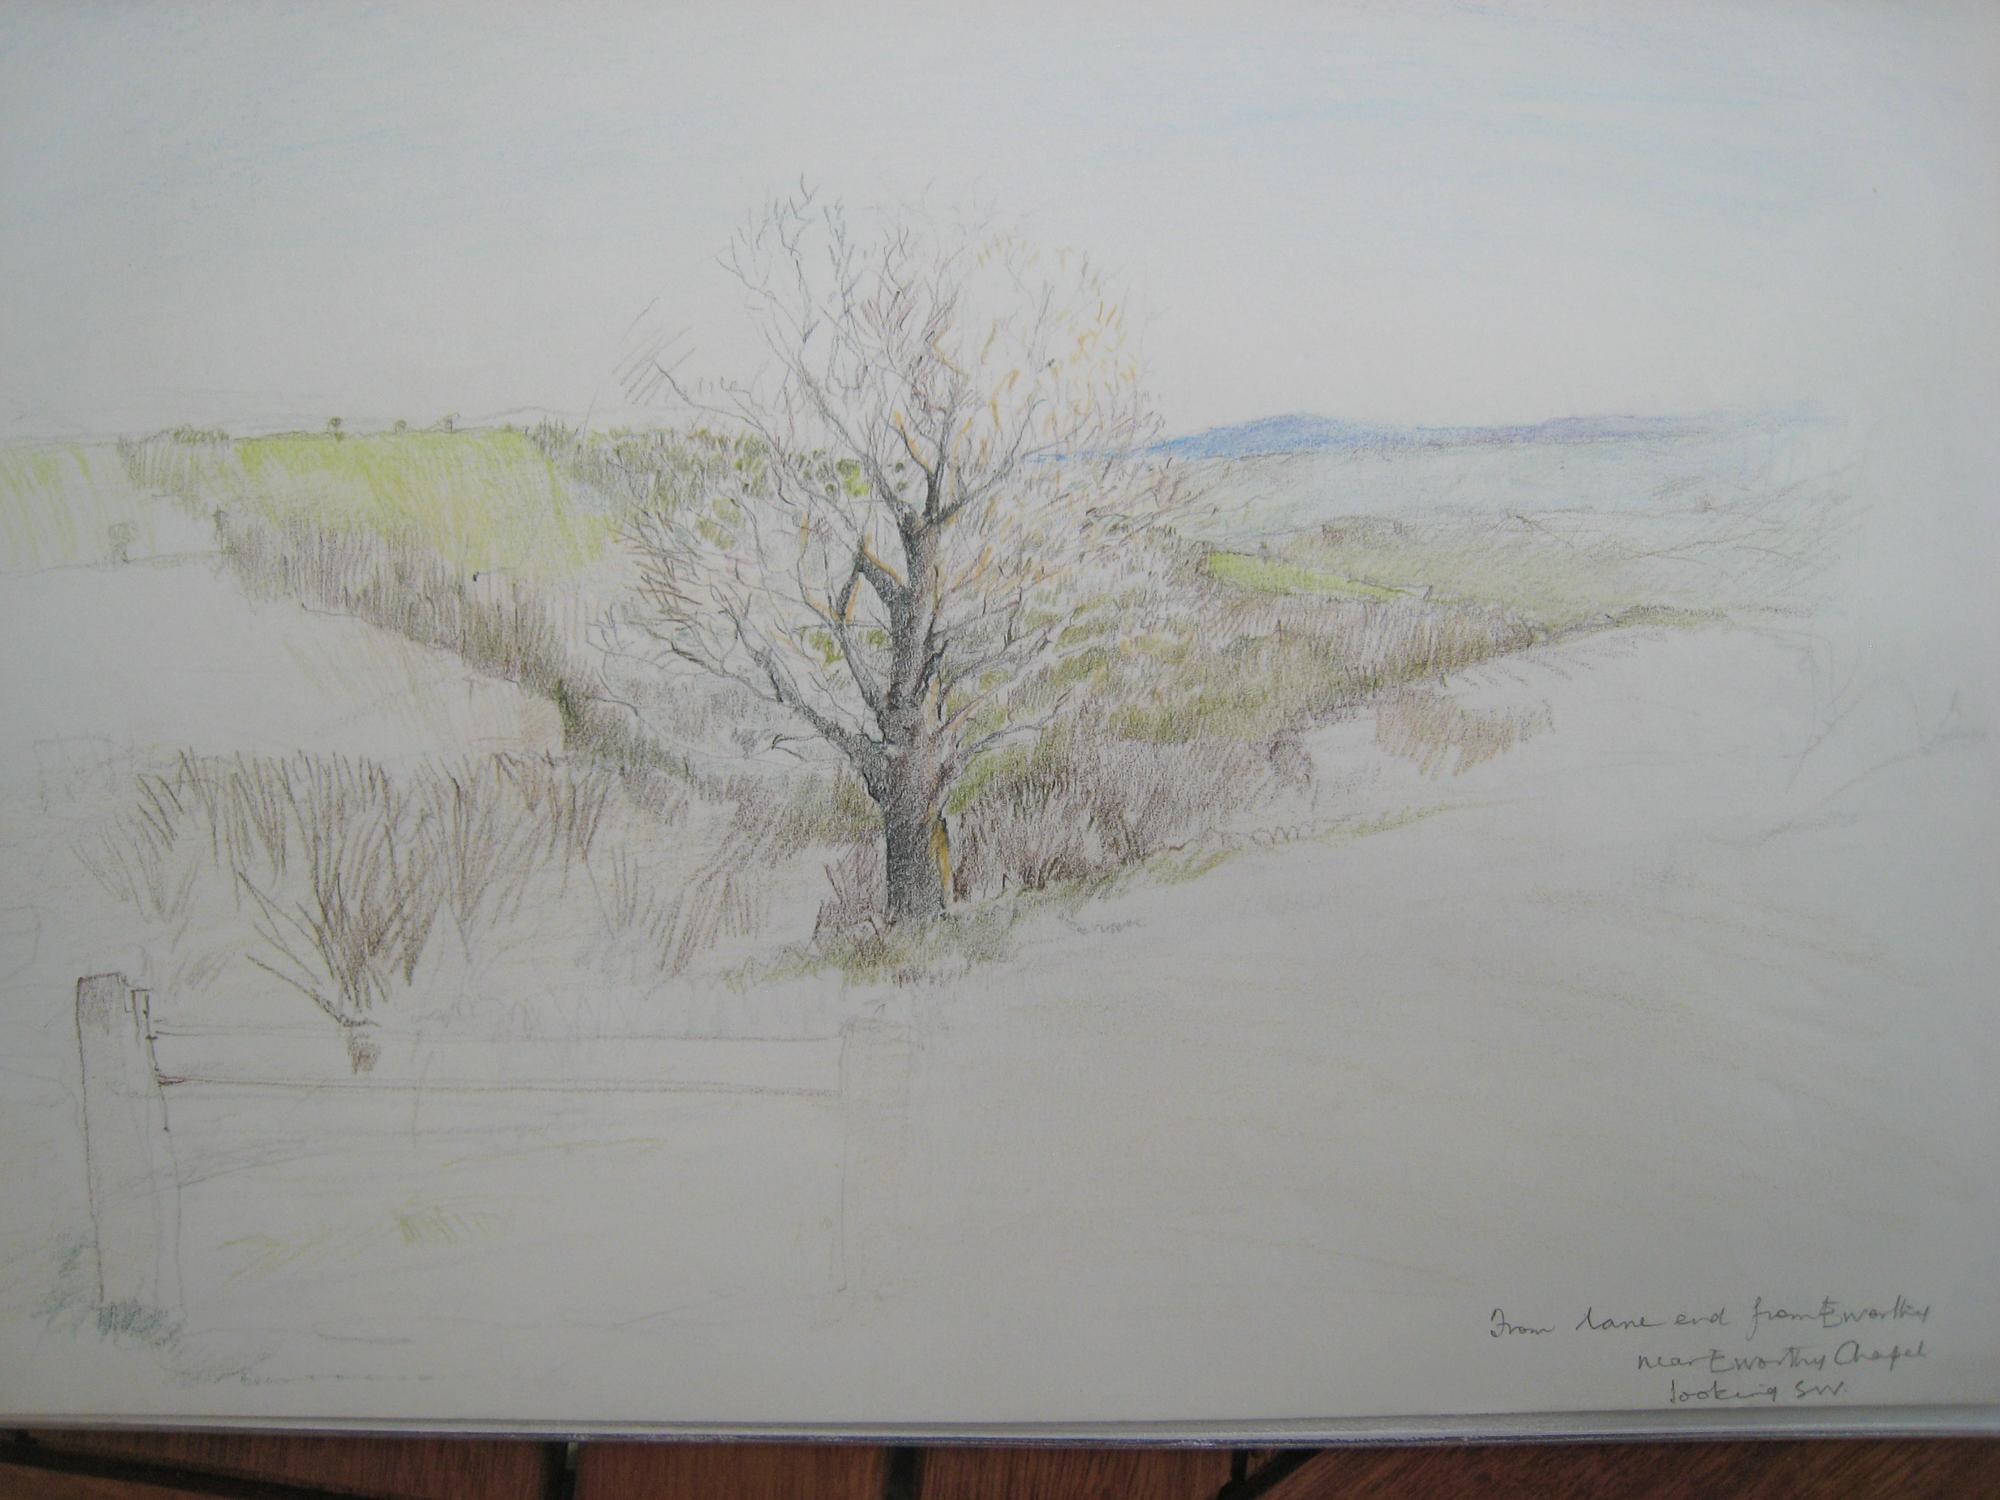 Germansweek landscapes, view SW towards Dartmoor from near Eworthy Chapel